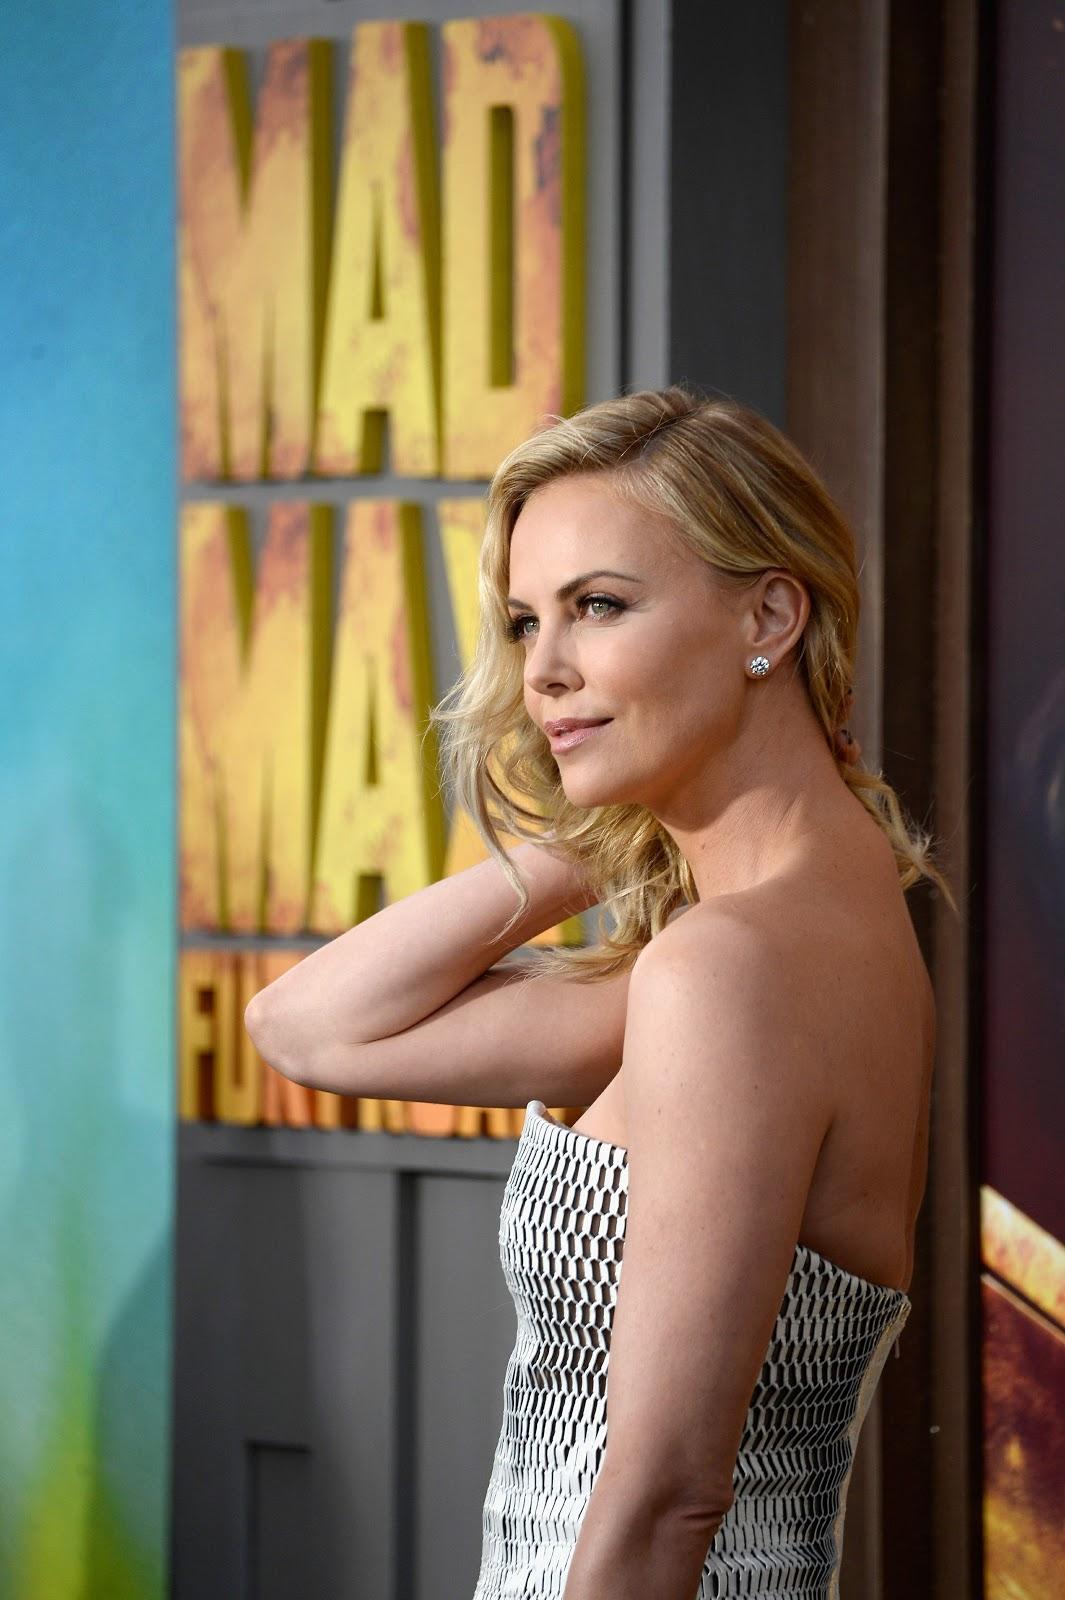 Mad Max - Fury Road actress Charlize Theron HD Photos & Wallpapers